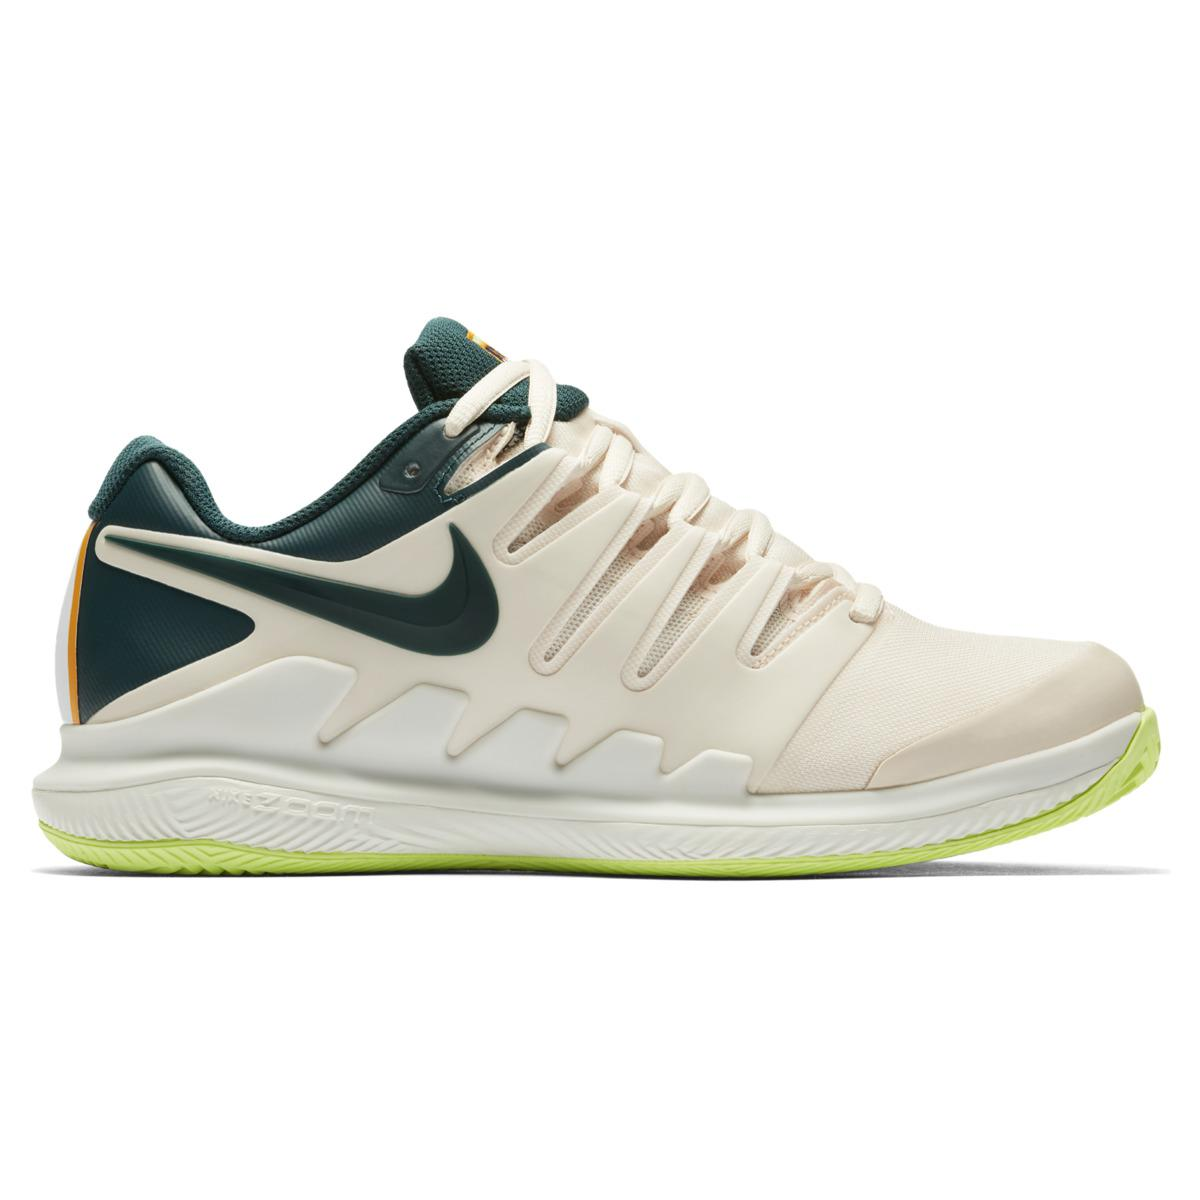 Nike. Women s Air Zoom Vapor X Clay Tennis padel Shoes 3166b5ae1f87e